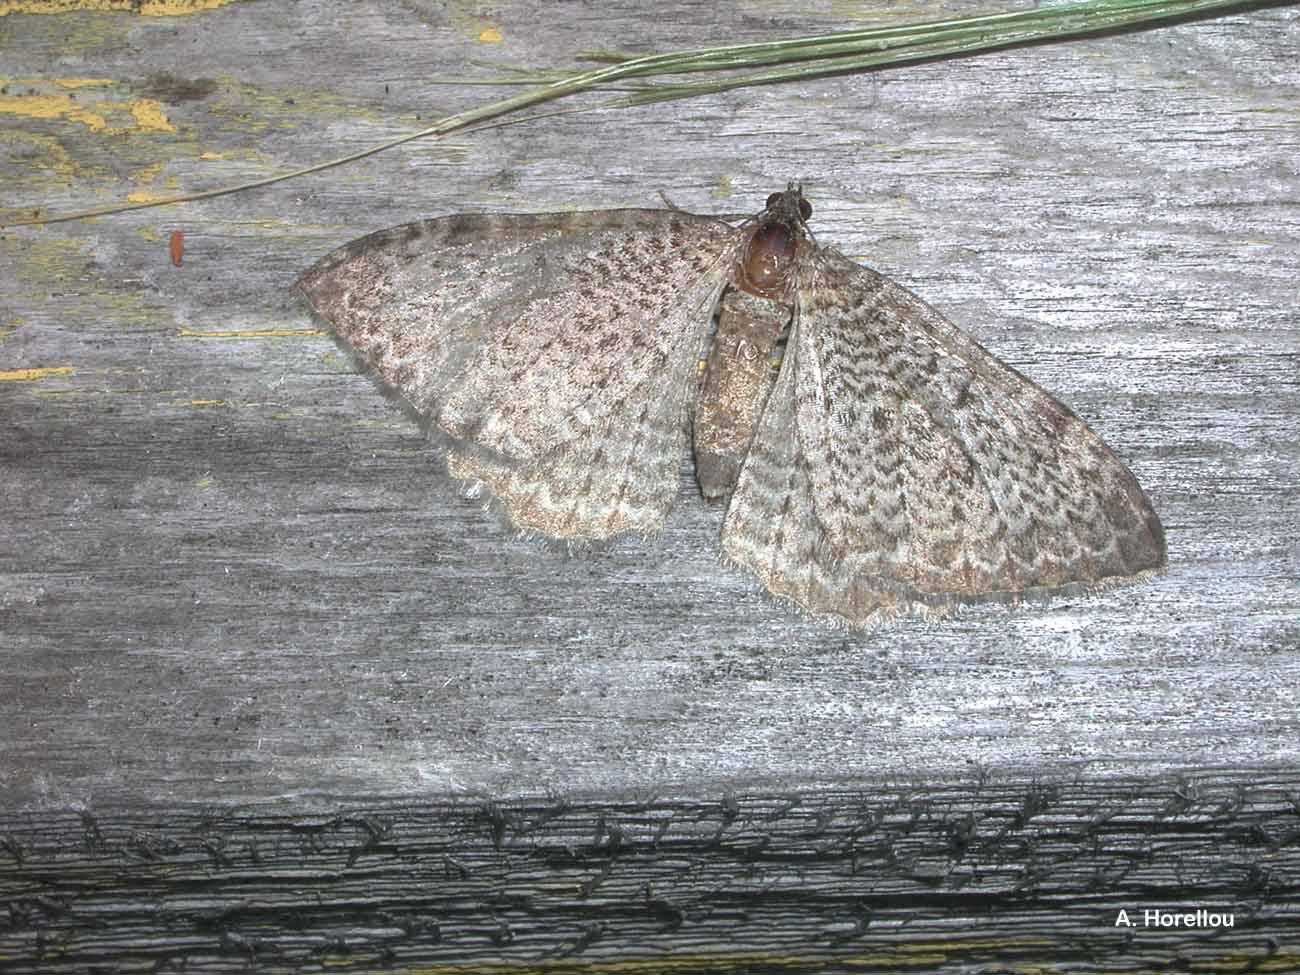 Rheumaptera undulata